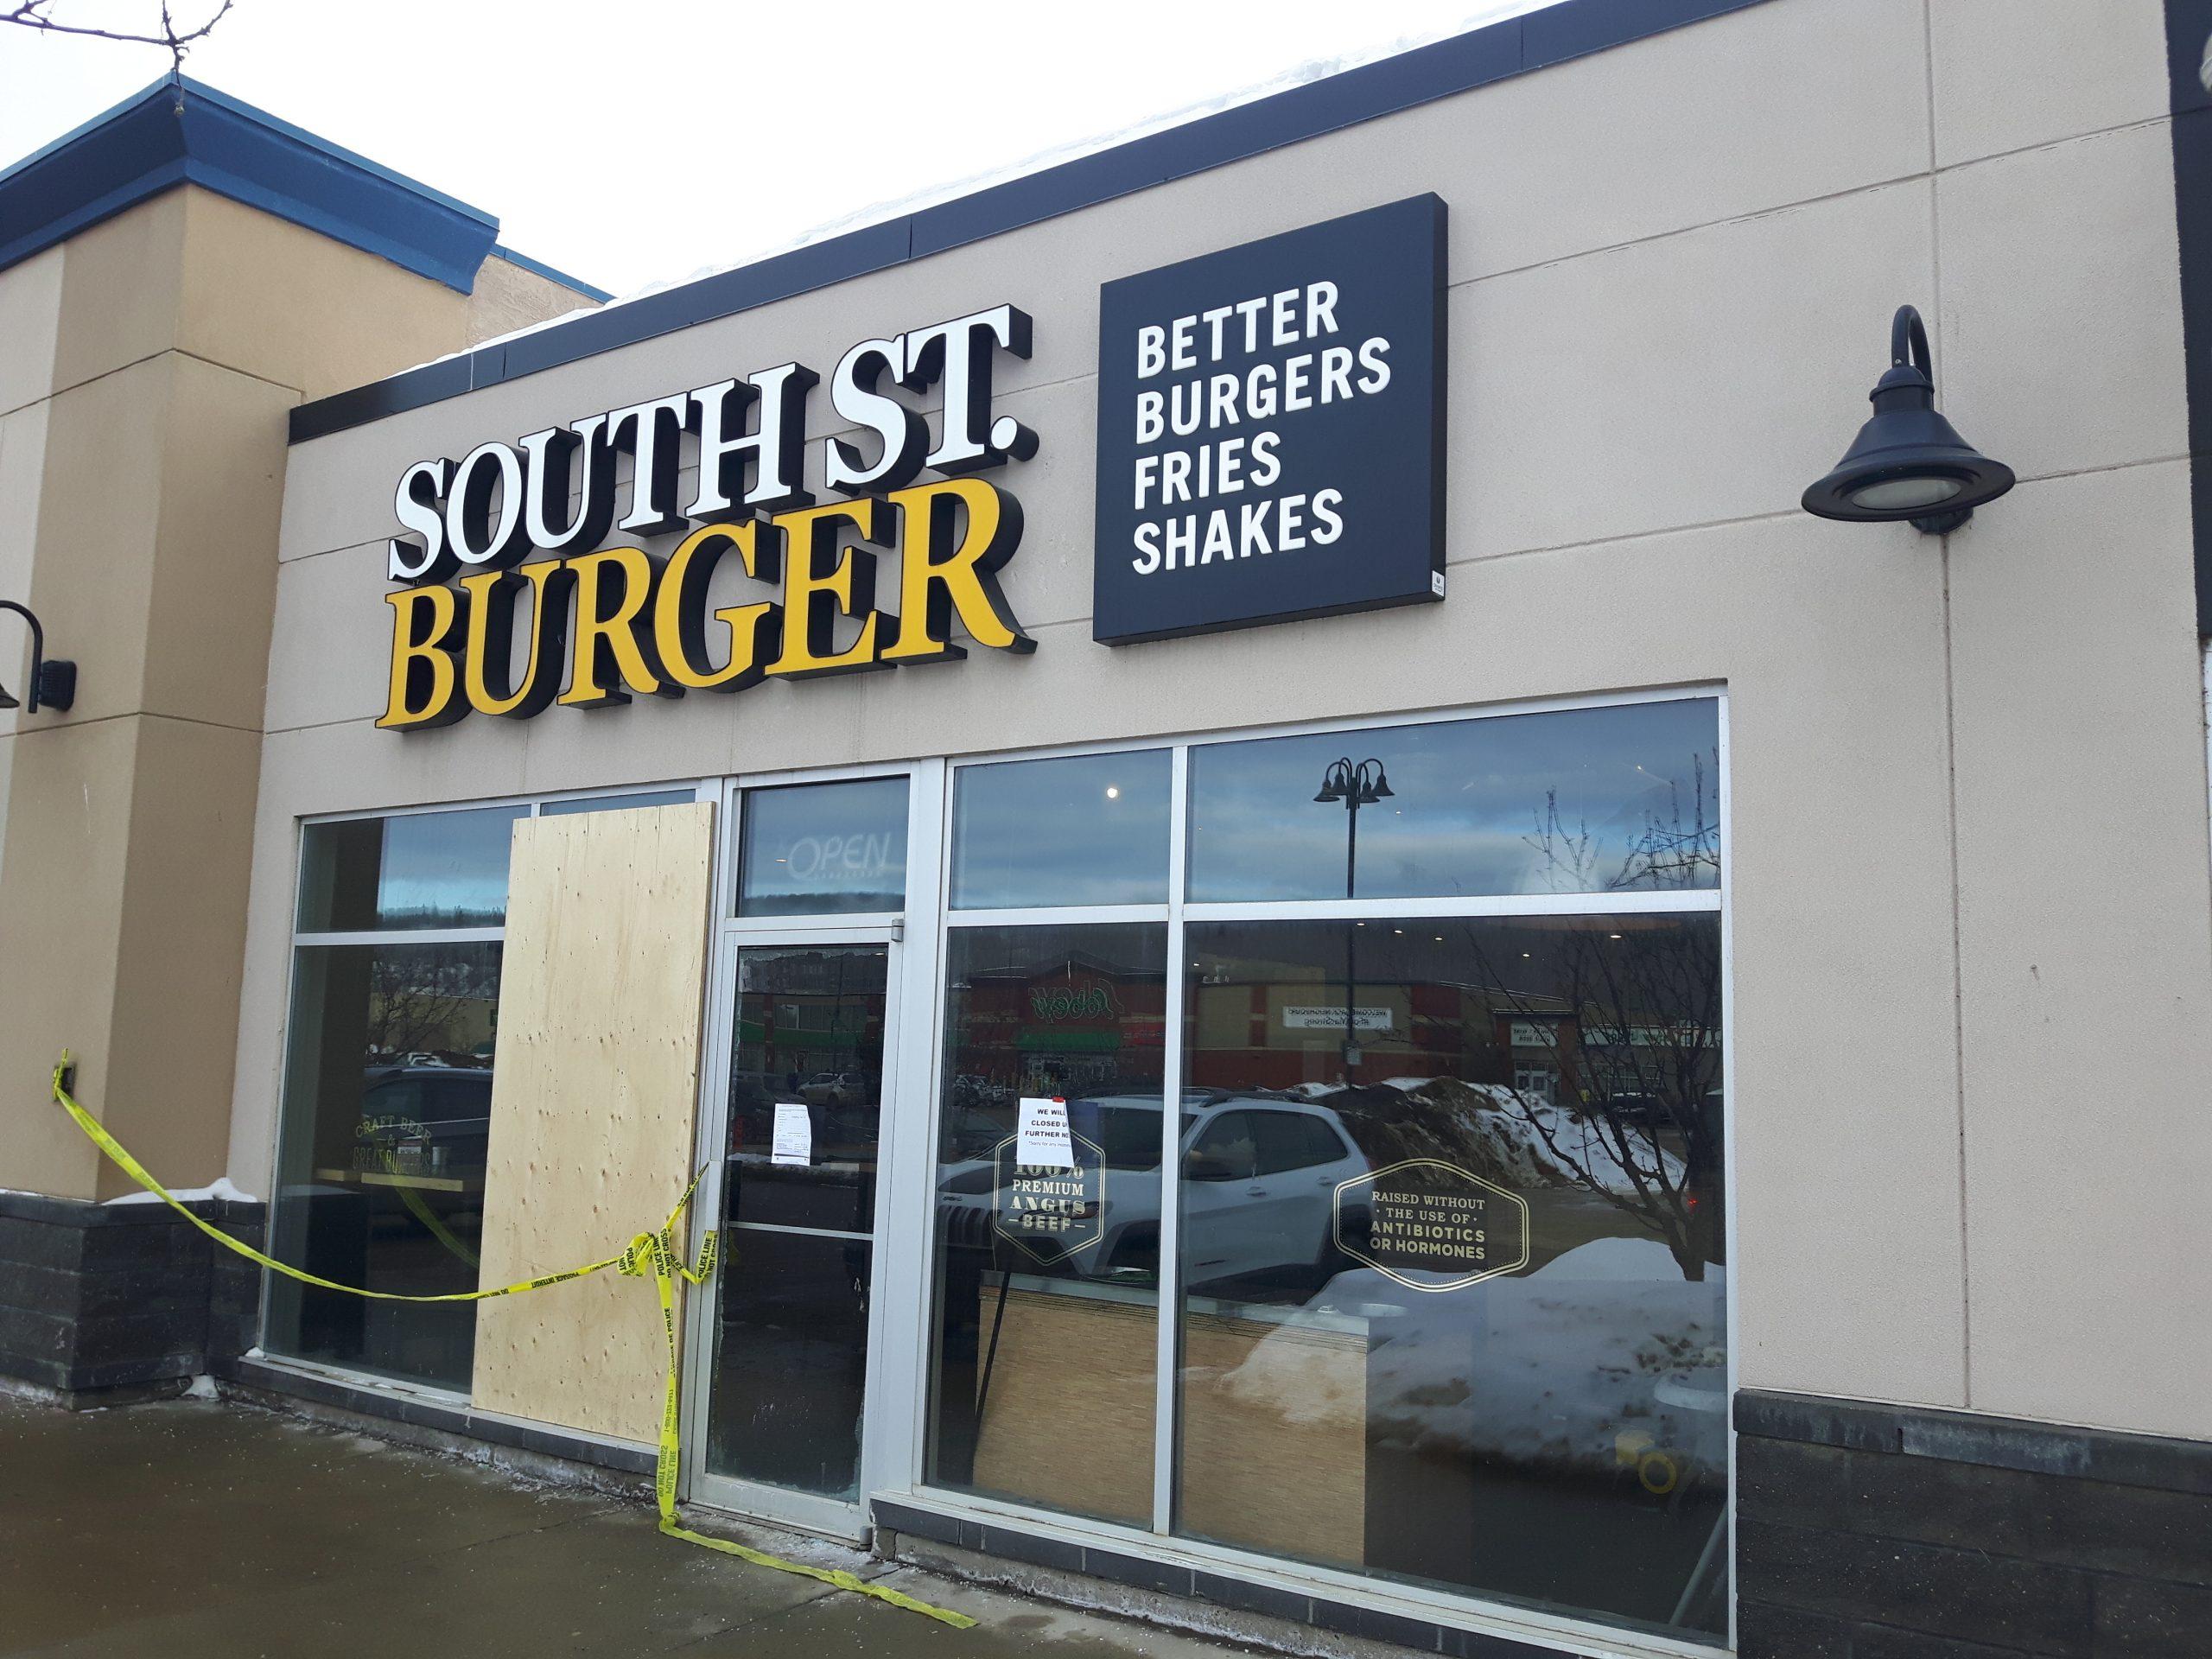 Wood Buffalo RCMP Investigate Arson At South Street Burger